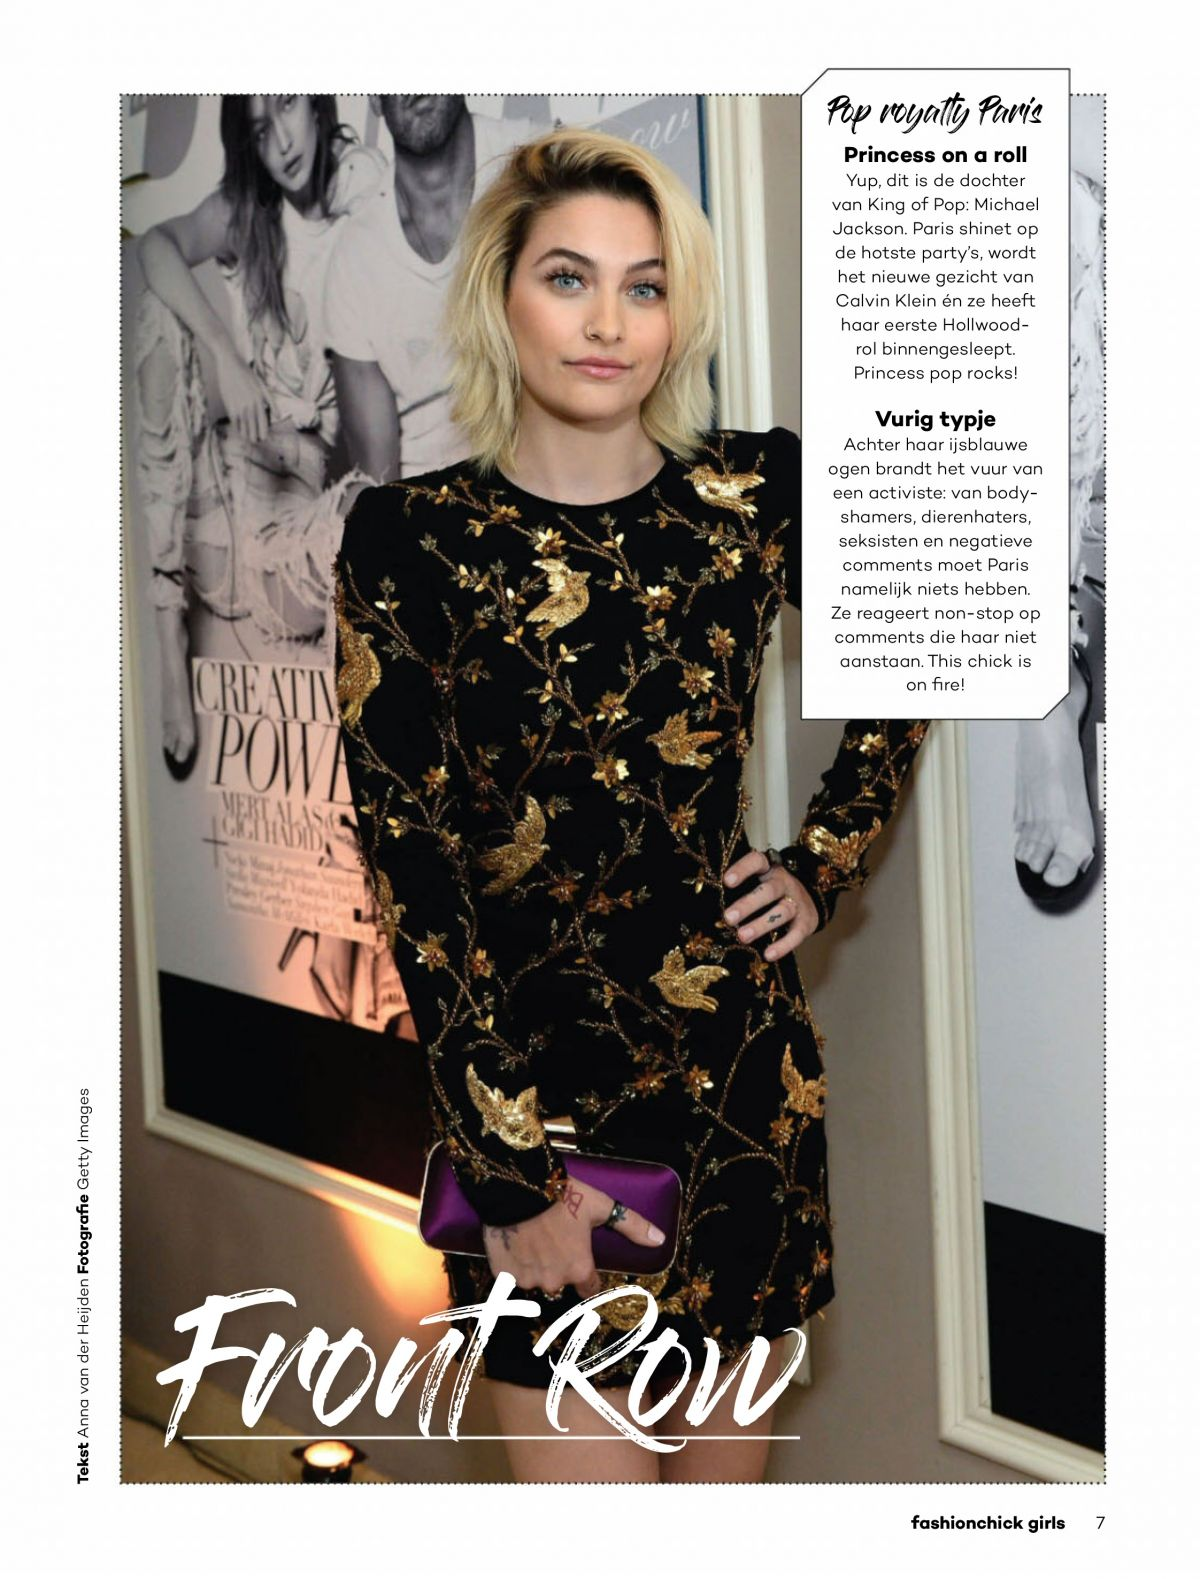 PARIS JACKSON in Fashionchick Girls Magazine, September 2017